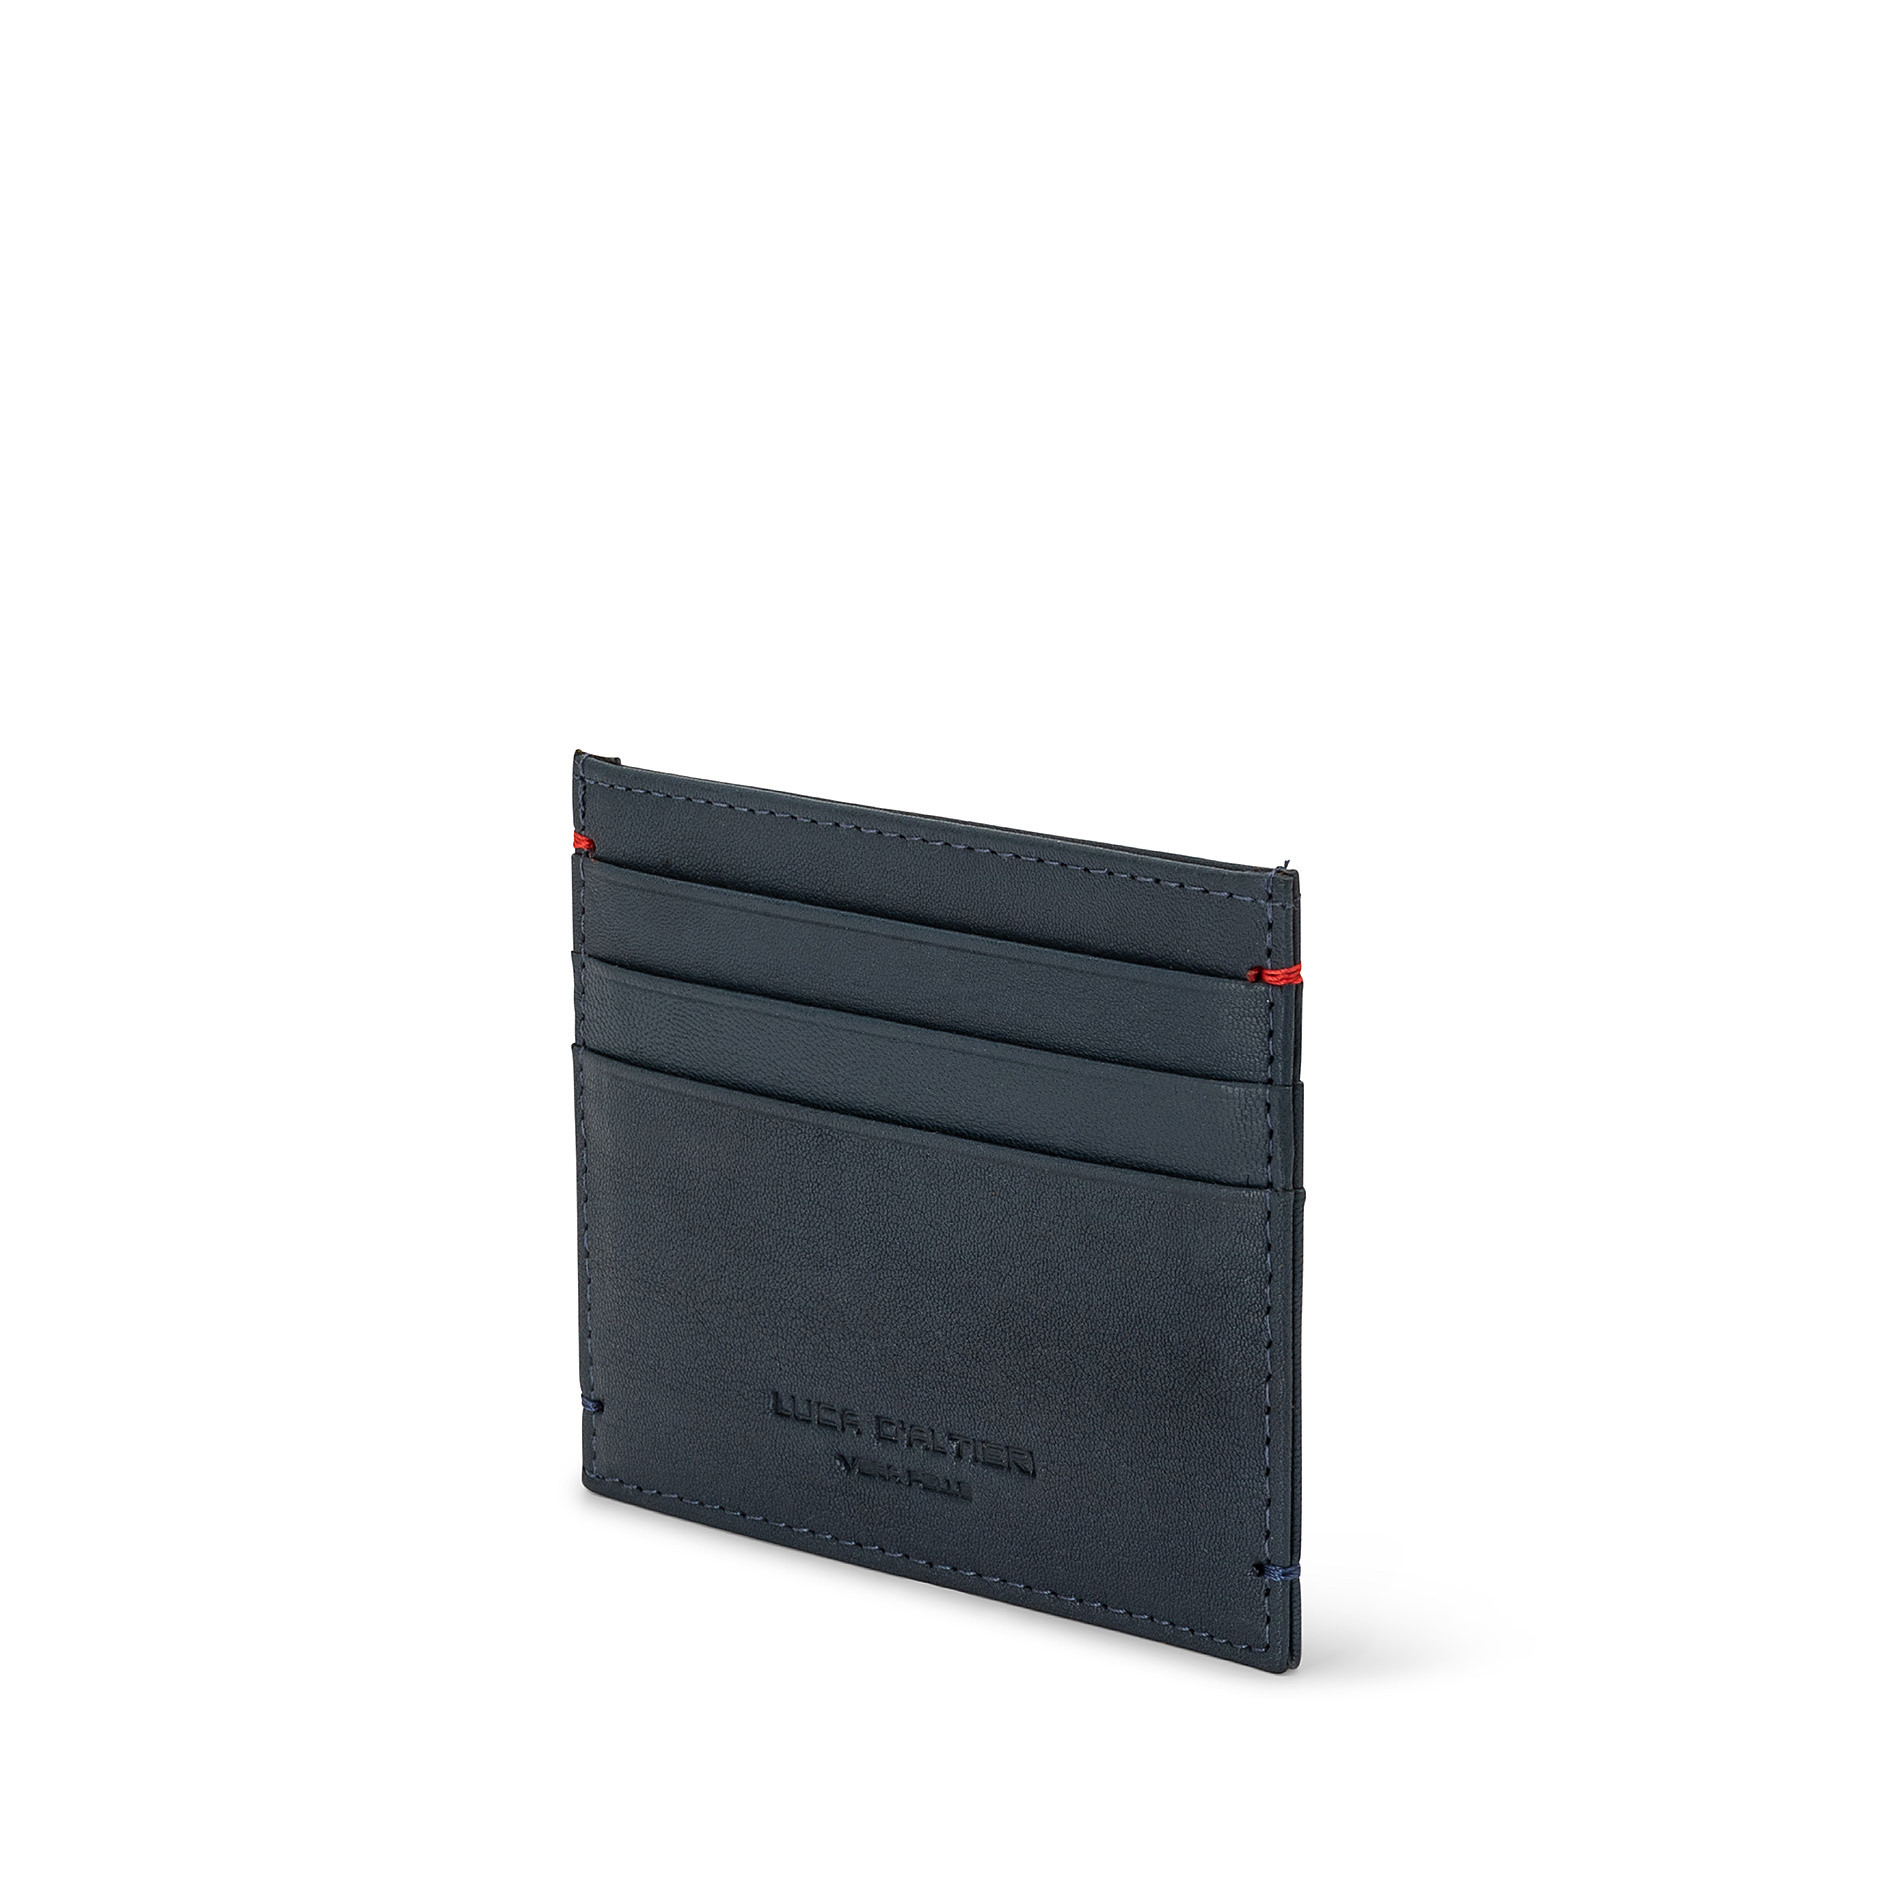 Porta carte di credito in pelle Luca D'Altieri, Blu, large image number 1